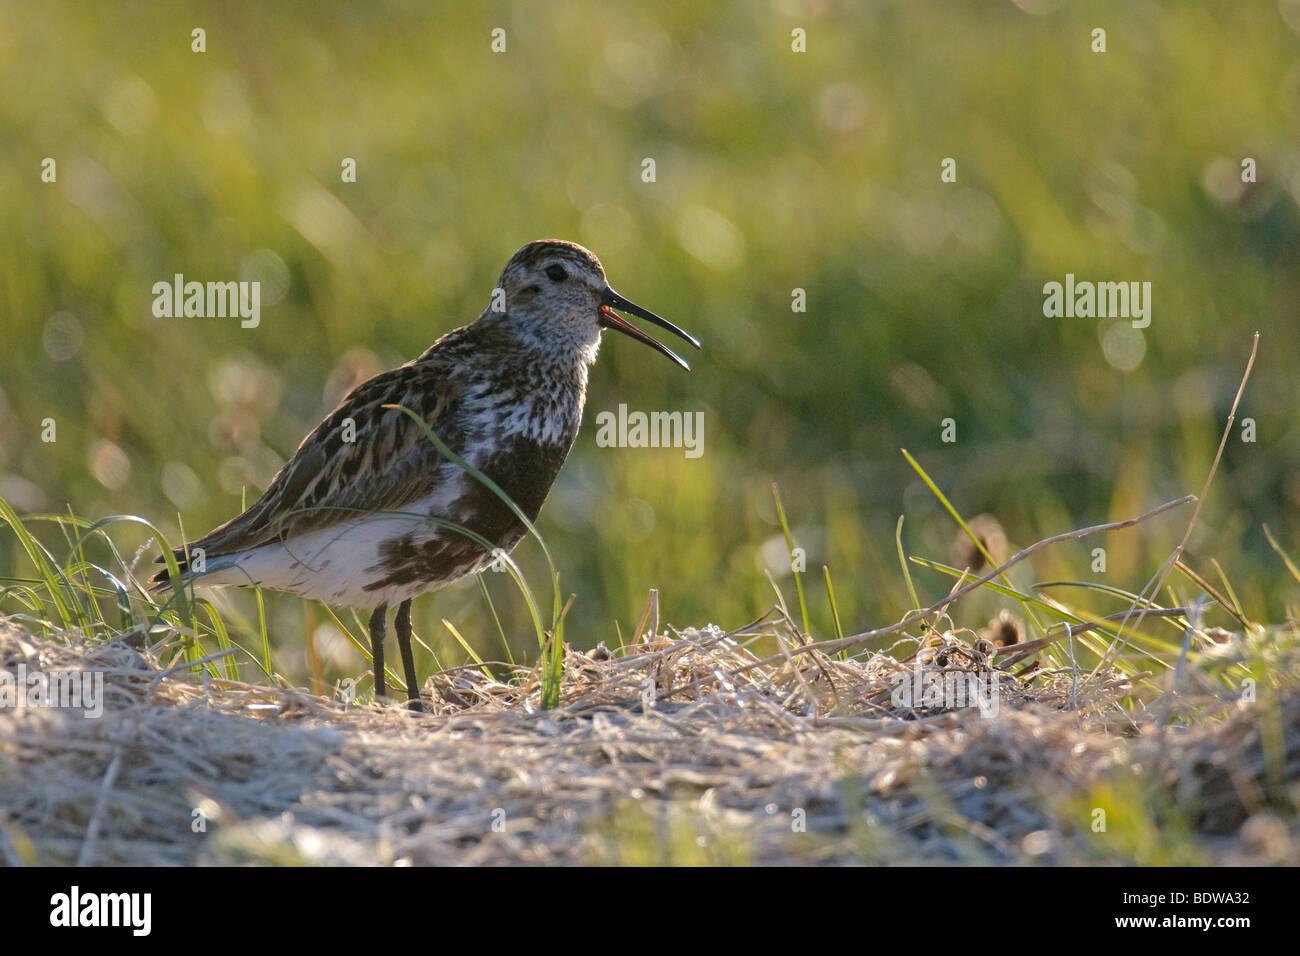 Dunlin Calidris alpina summer adult singing. Island of North Uist, Western Isles, Scotland. - Stock Image